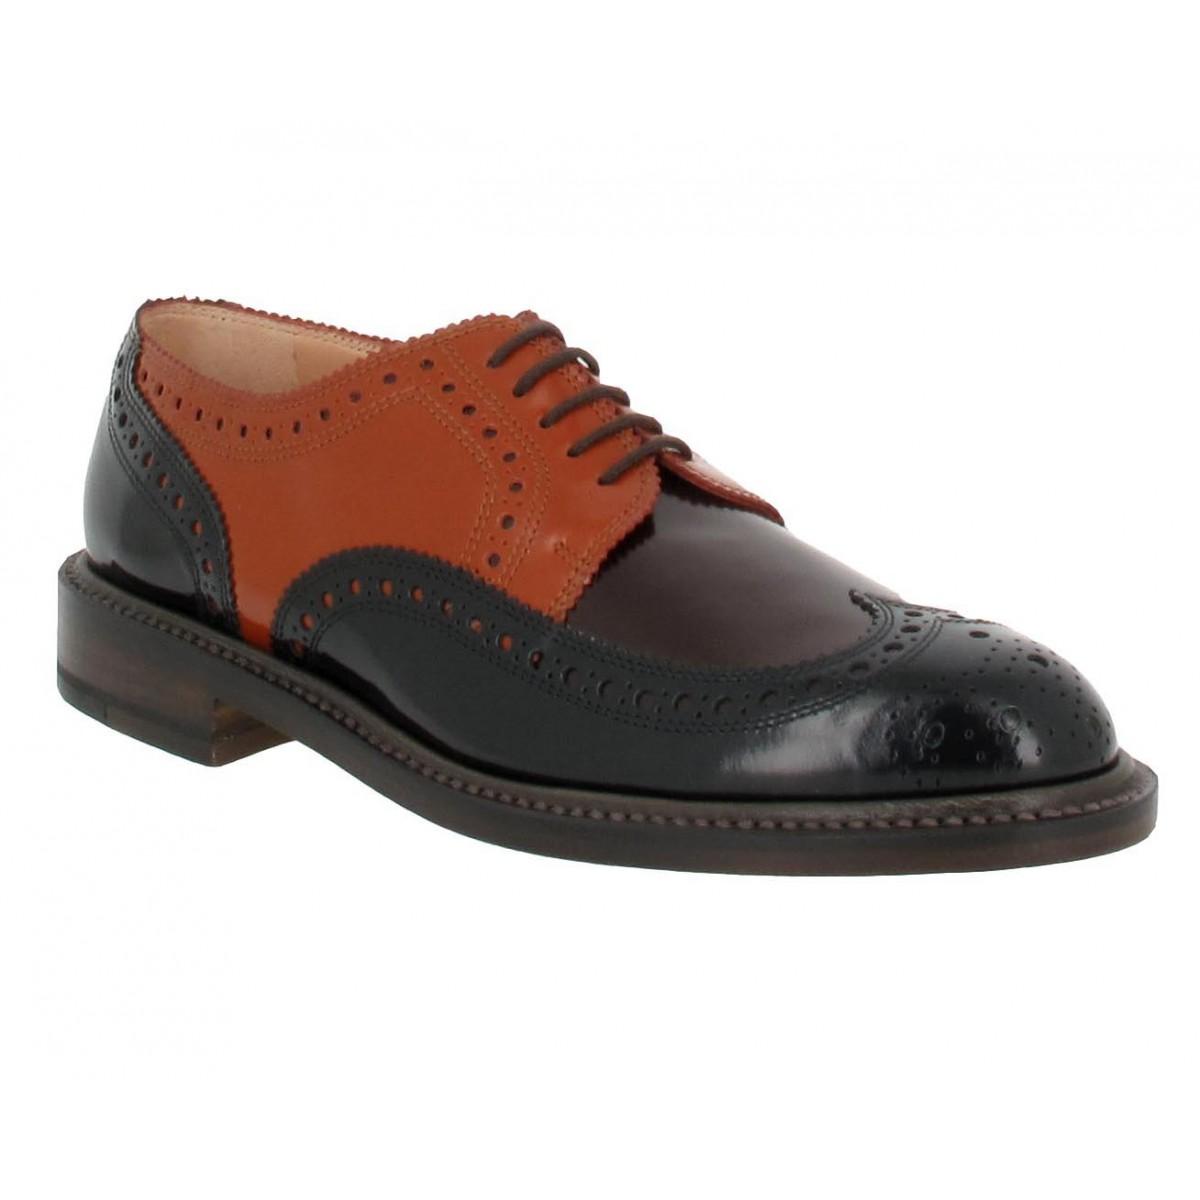 Chaussures à lacets ROBERT CLERGERIE Roeld cuir Femme Marron Multi